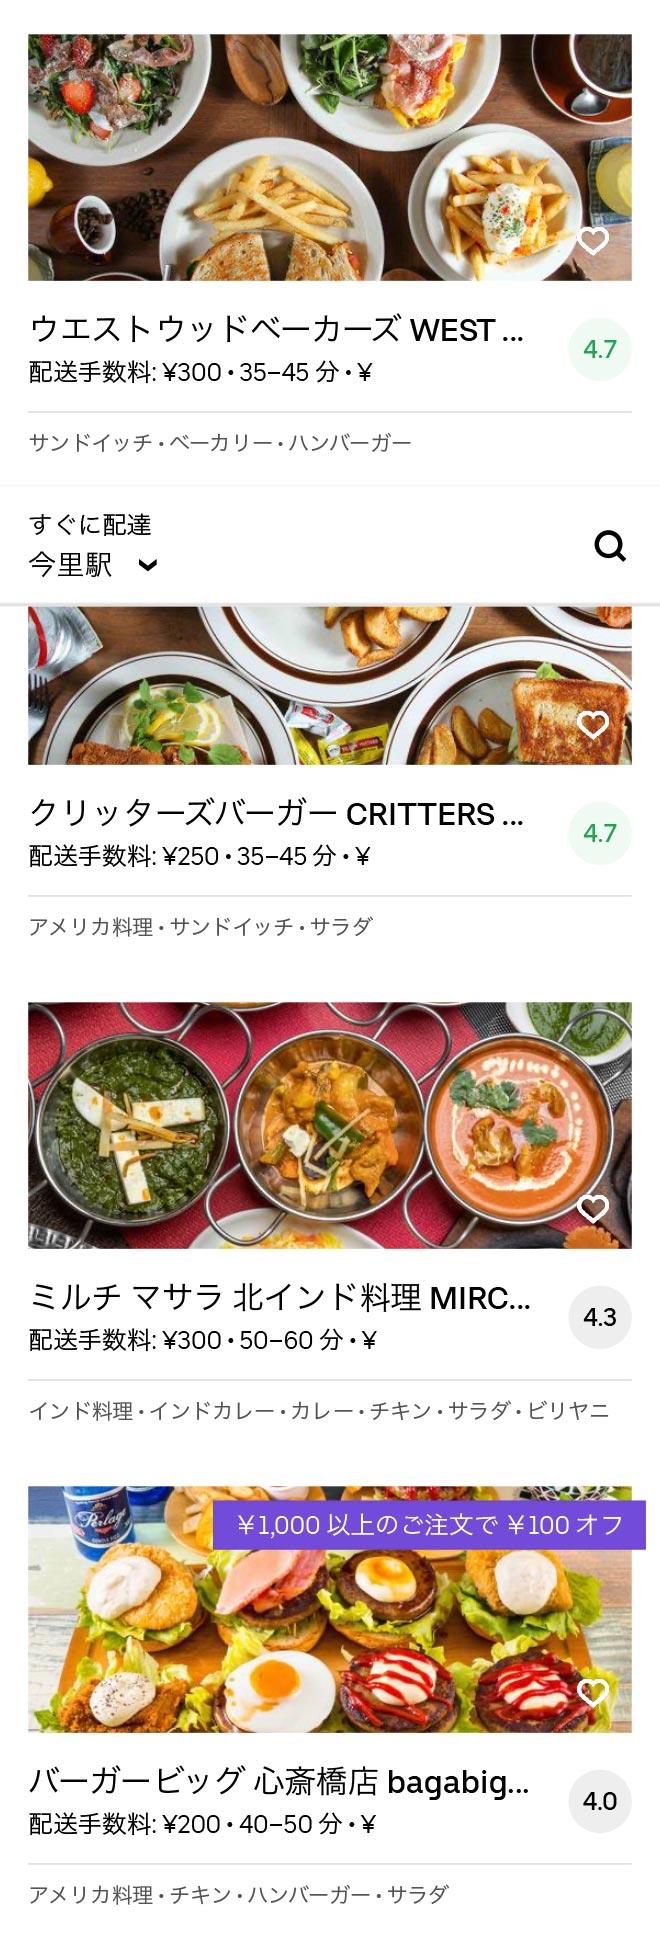 Osaka imazato menu 2005 07